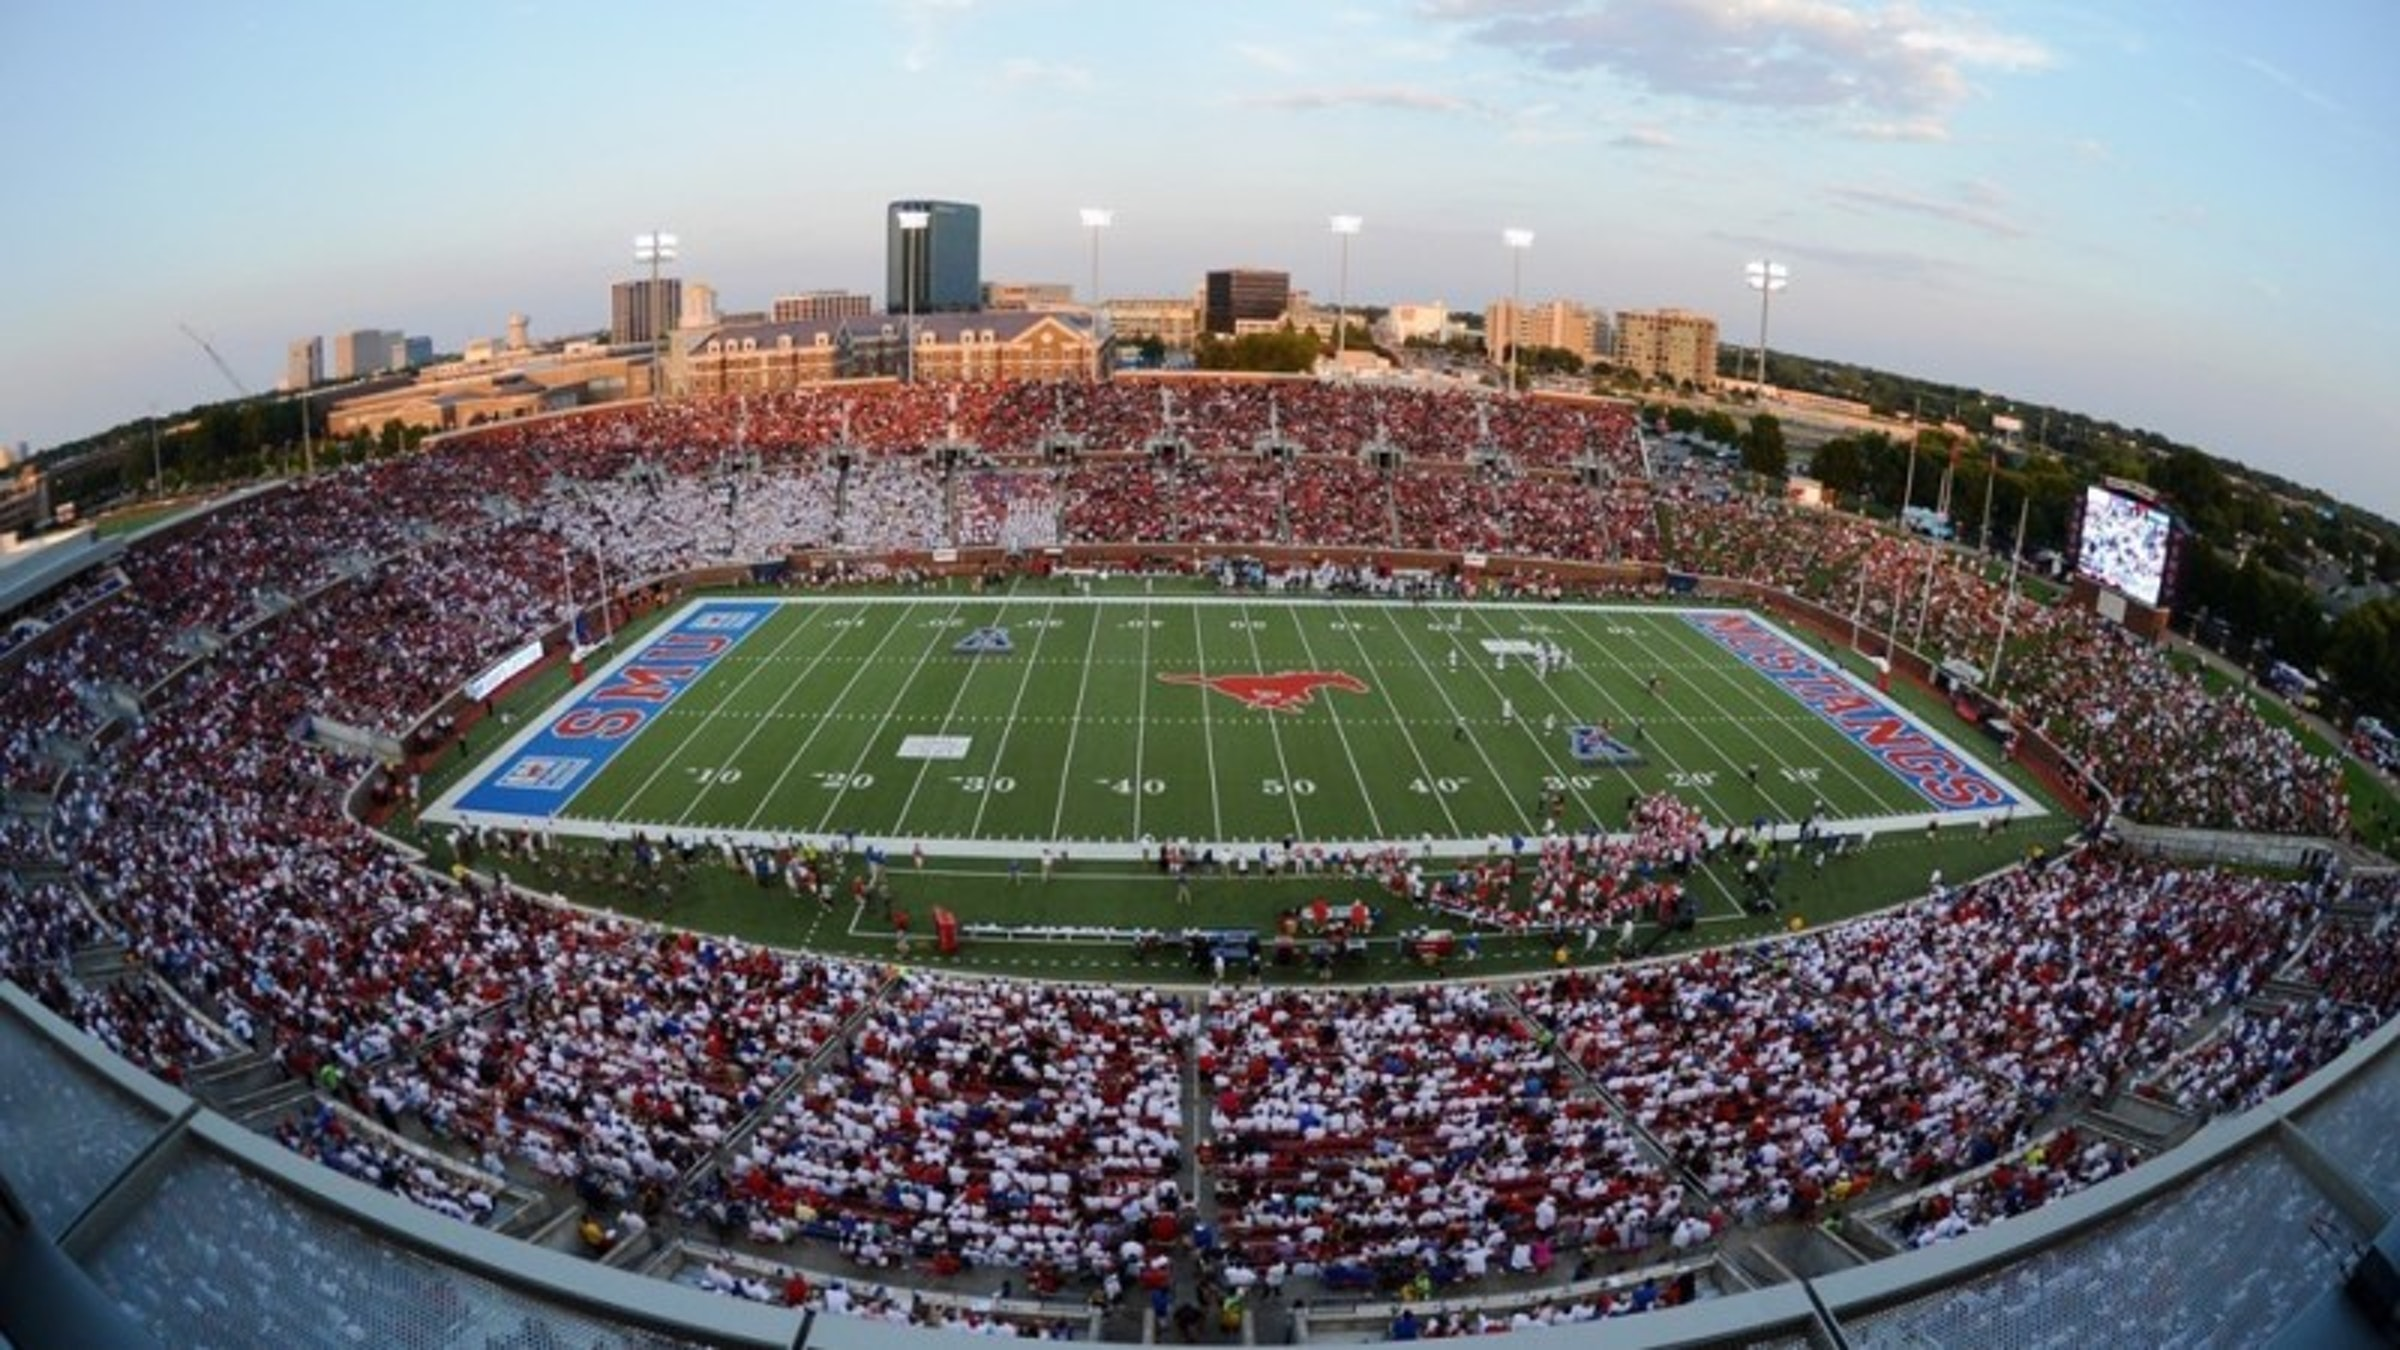 SMU - Gerald J. Ford Stadium in Beyond Dallas